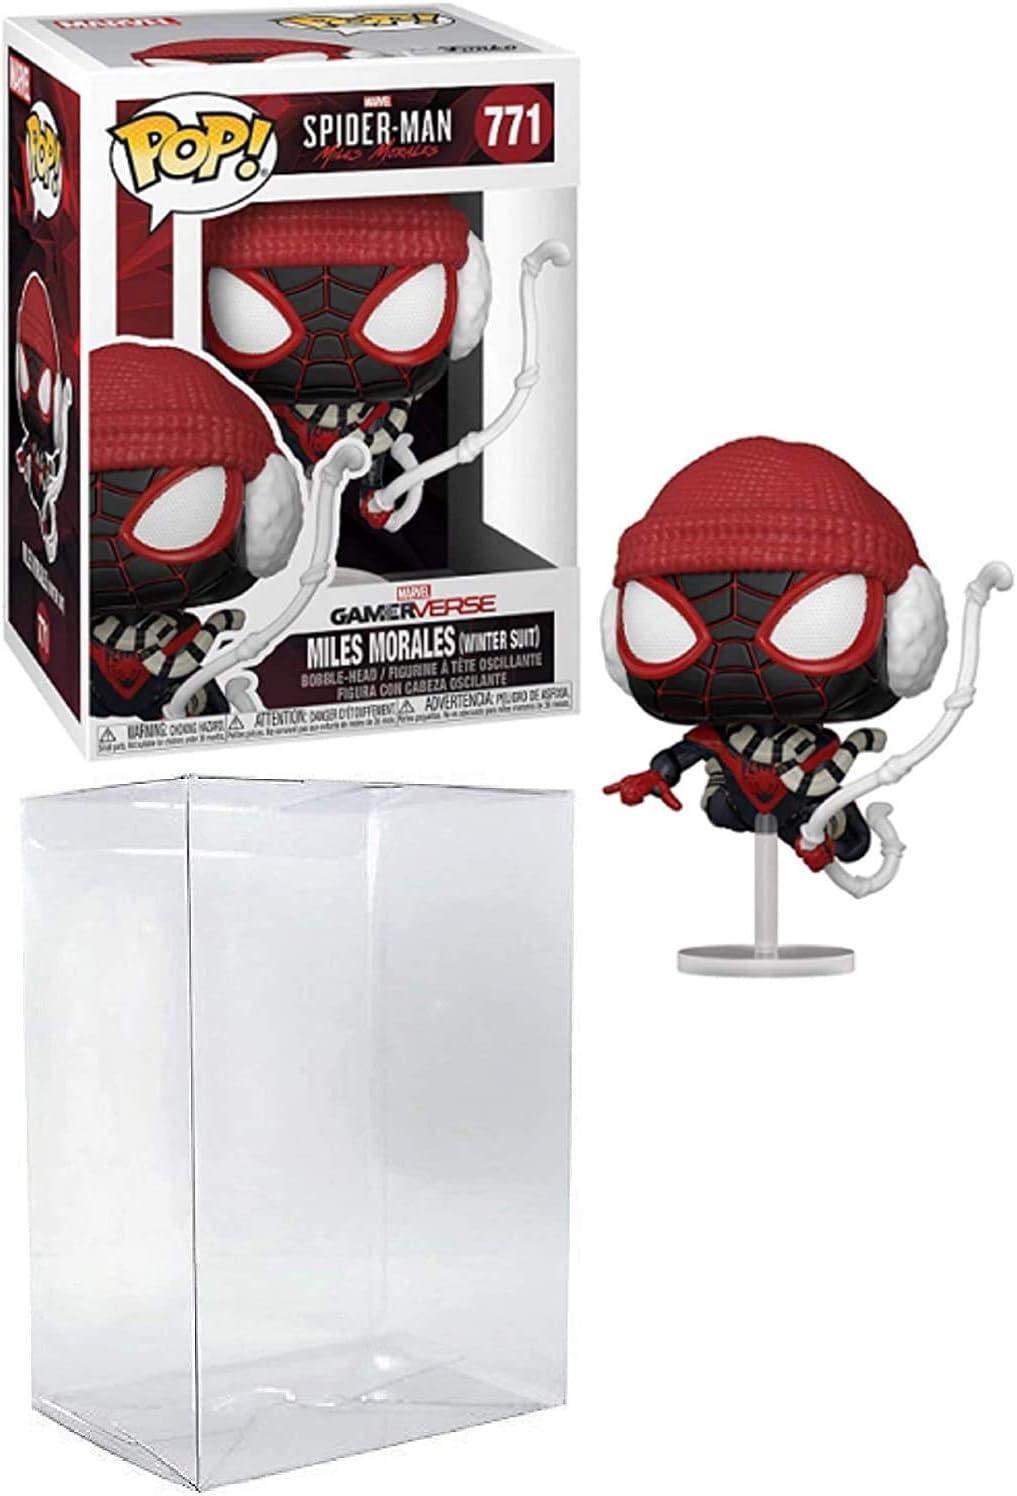 Spider-Man Miles Morales Winter Suit Pop # 771 Marvel Gamerverse Vinyl Figure (Bundled with EcoTek Protector to Protect Display Box)